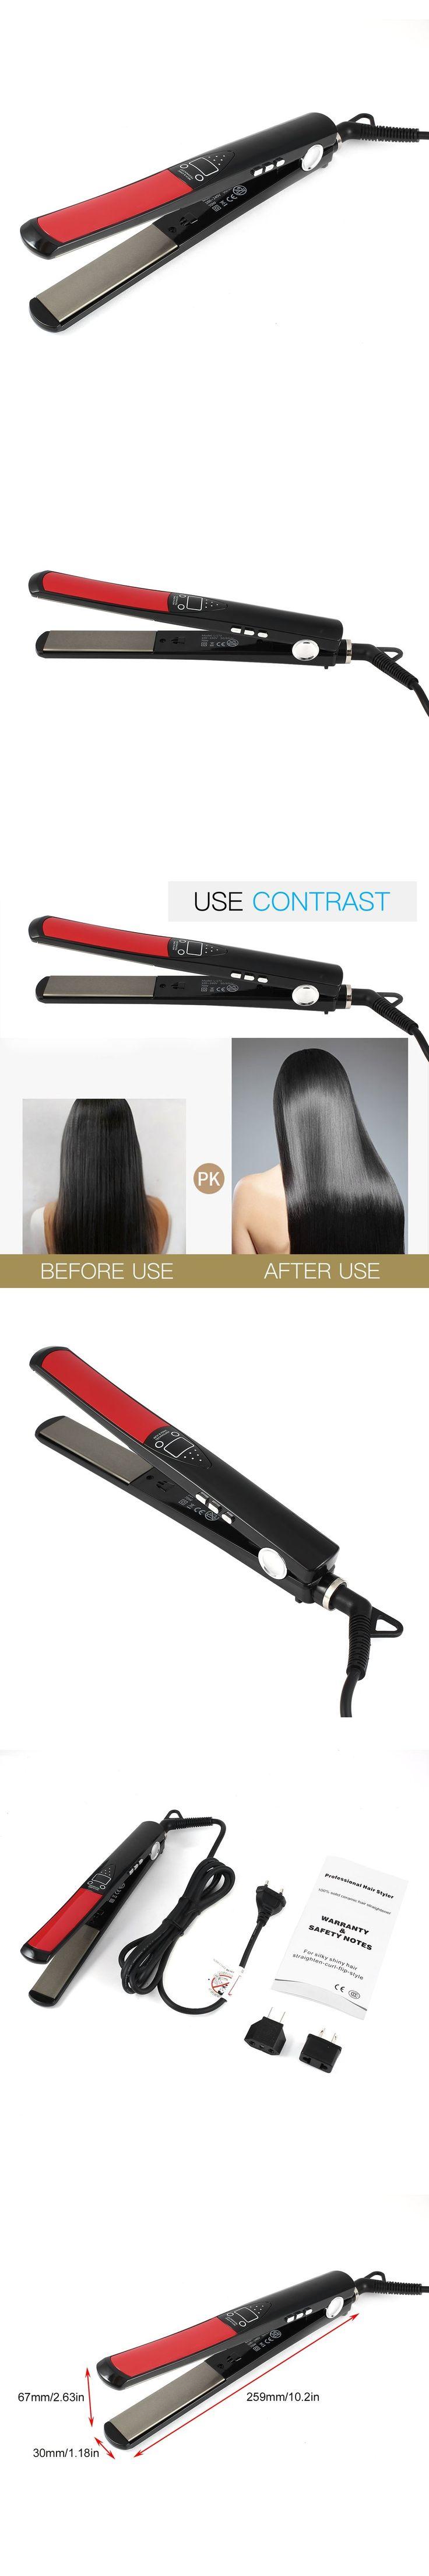 Hair Straightener for Silky Shiny Hair Styler Solid Ceramic Hair Straighten-Curl-Flip Style Home Hair Salon  EU/ US/AU plug